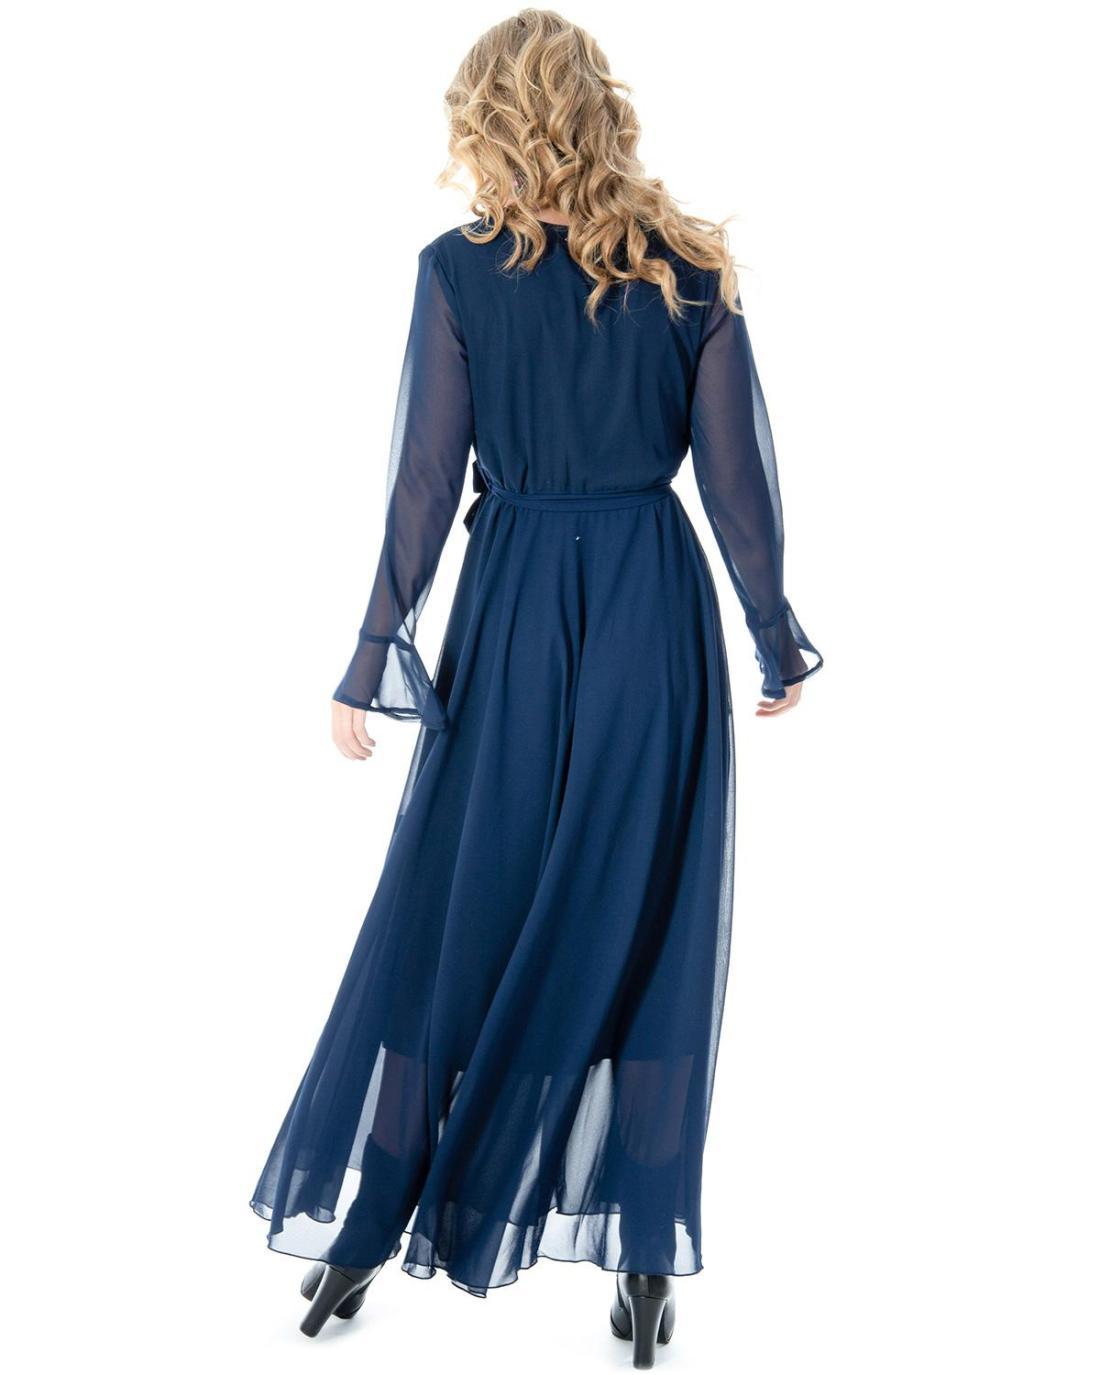 Kleide blau